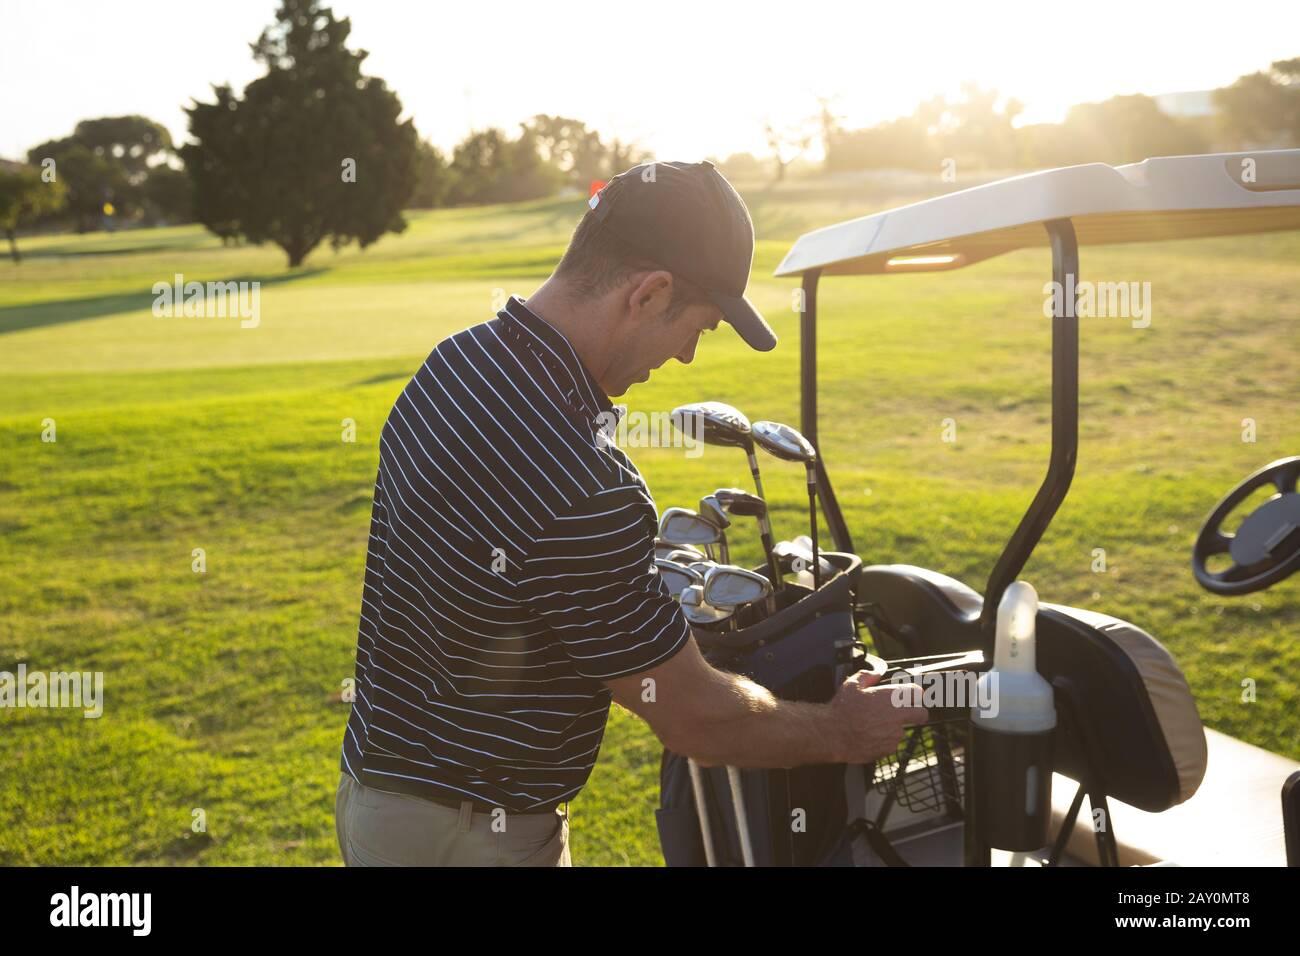 Sac de golf golfeur Banque D'Images